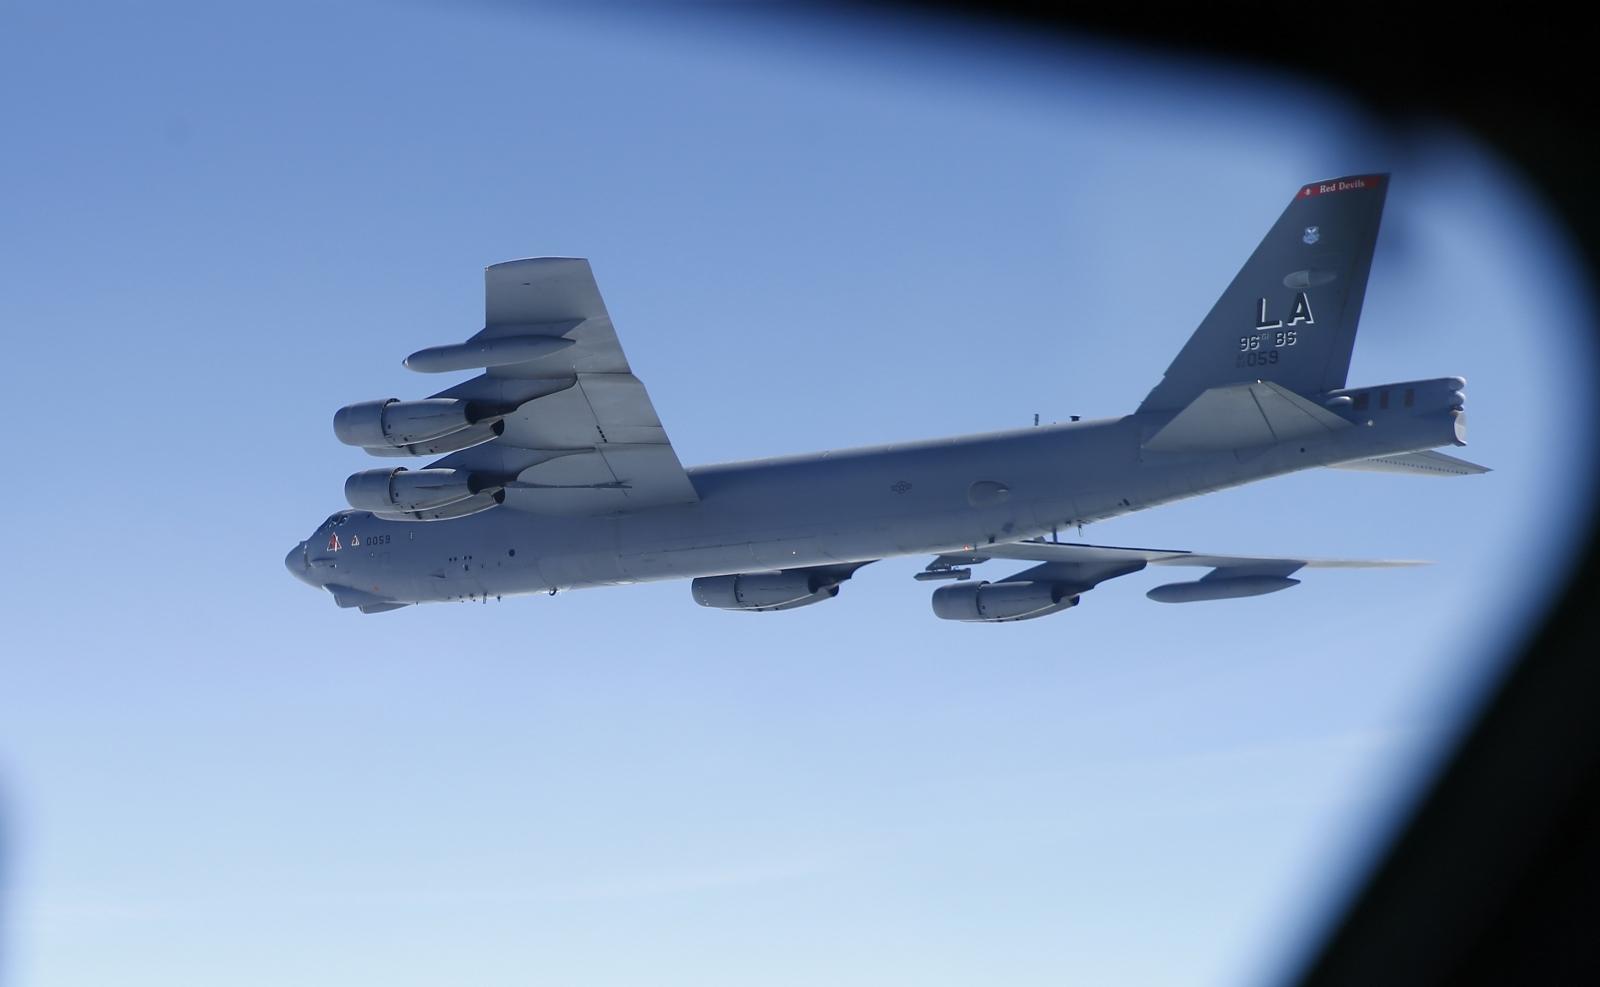 US B-52 Bomber